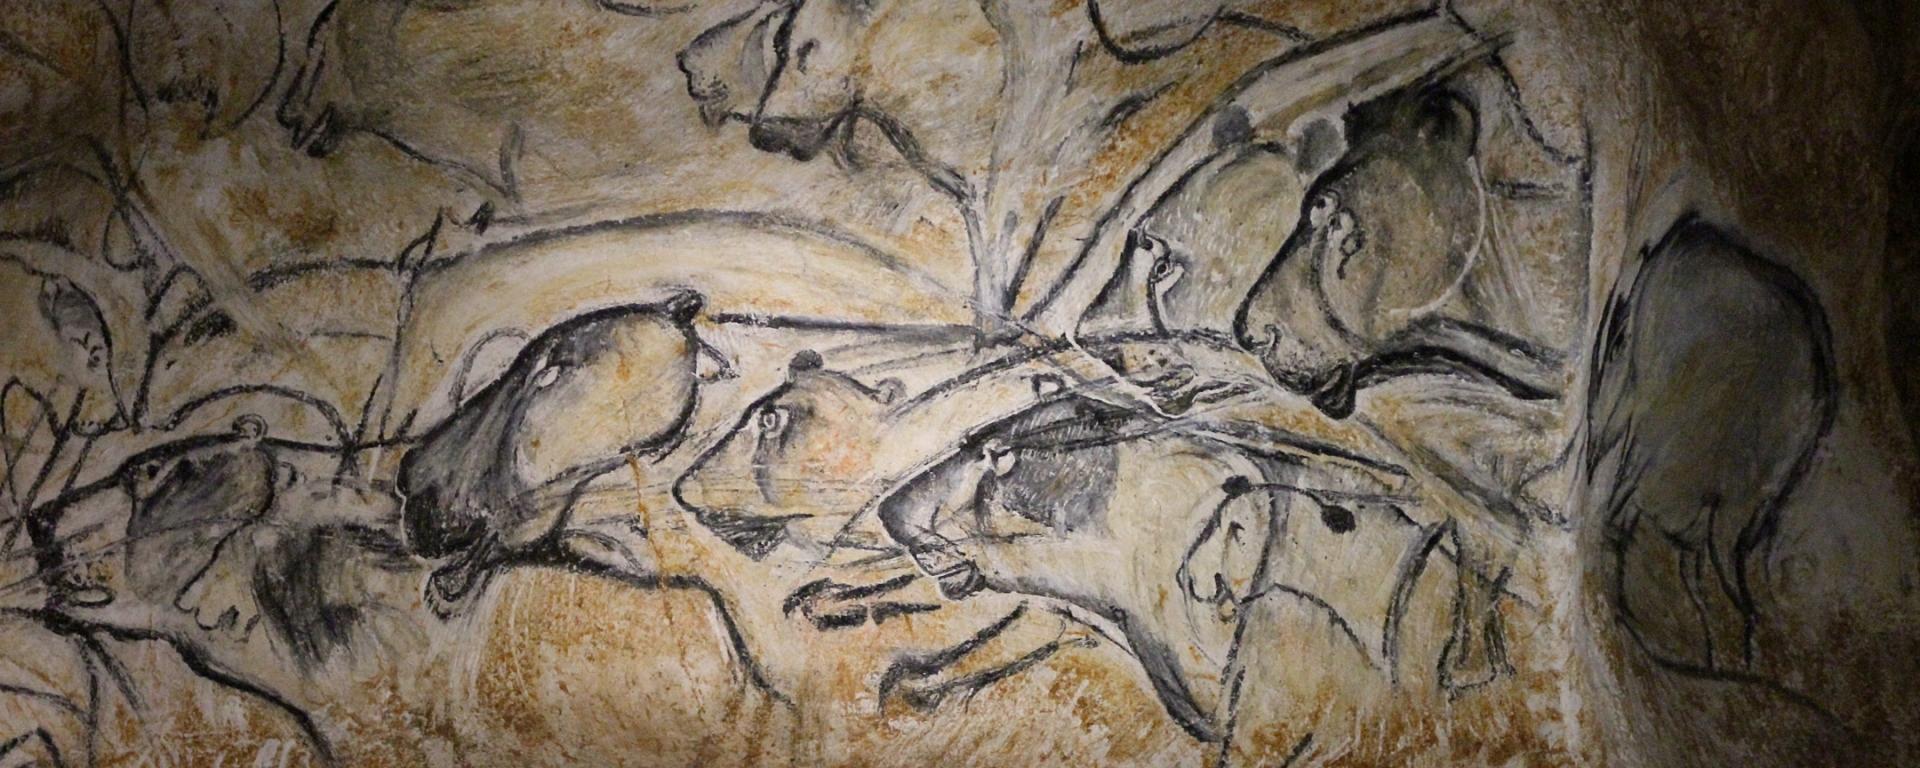 datant de l'art rupestre australien